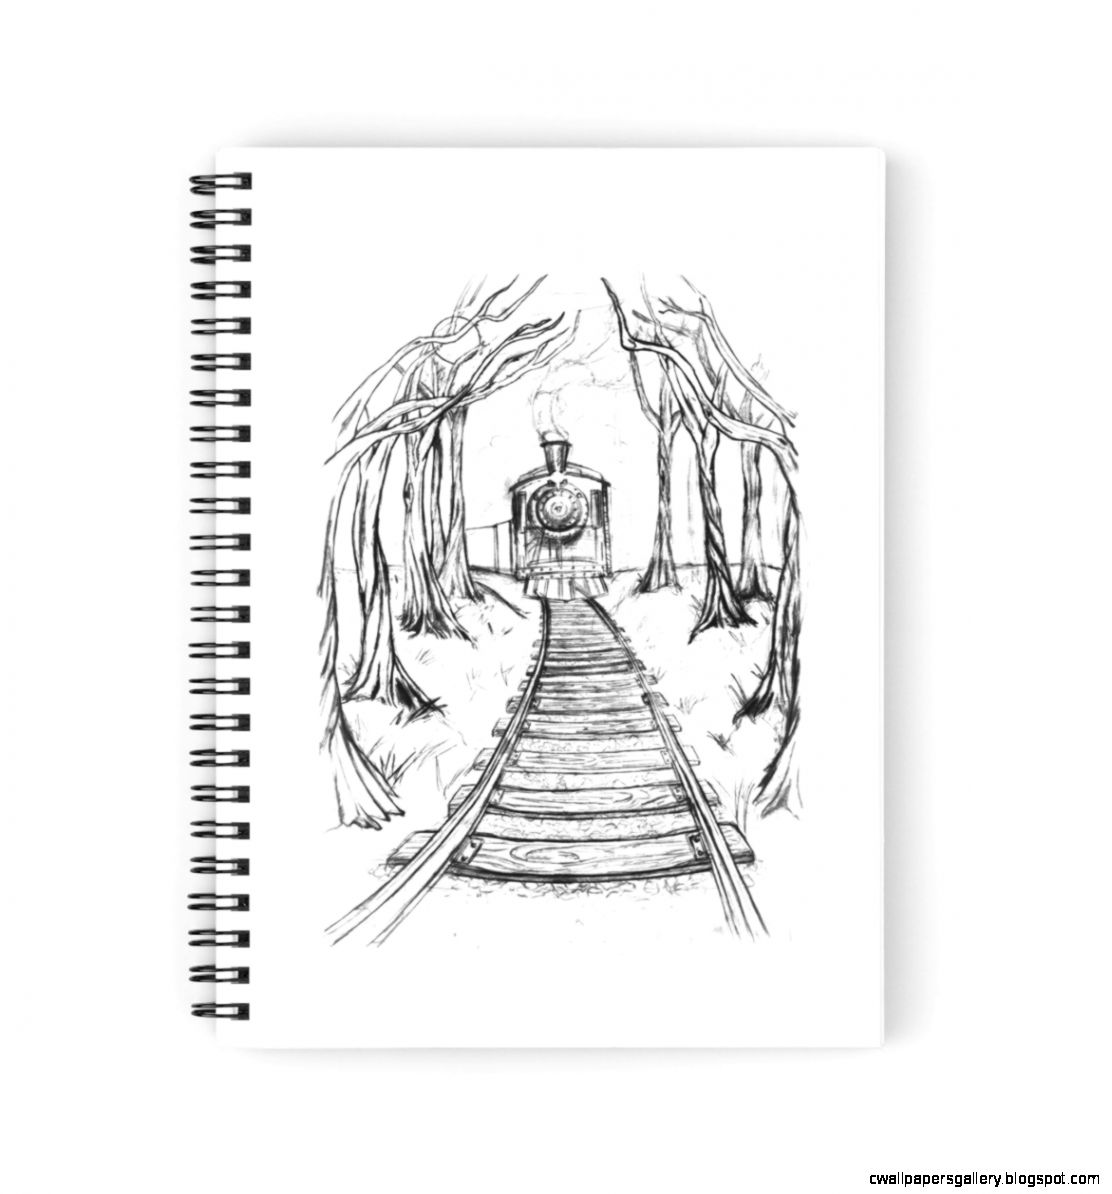 Wooden Railway  Pencil illustration railroad train tracks in